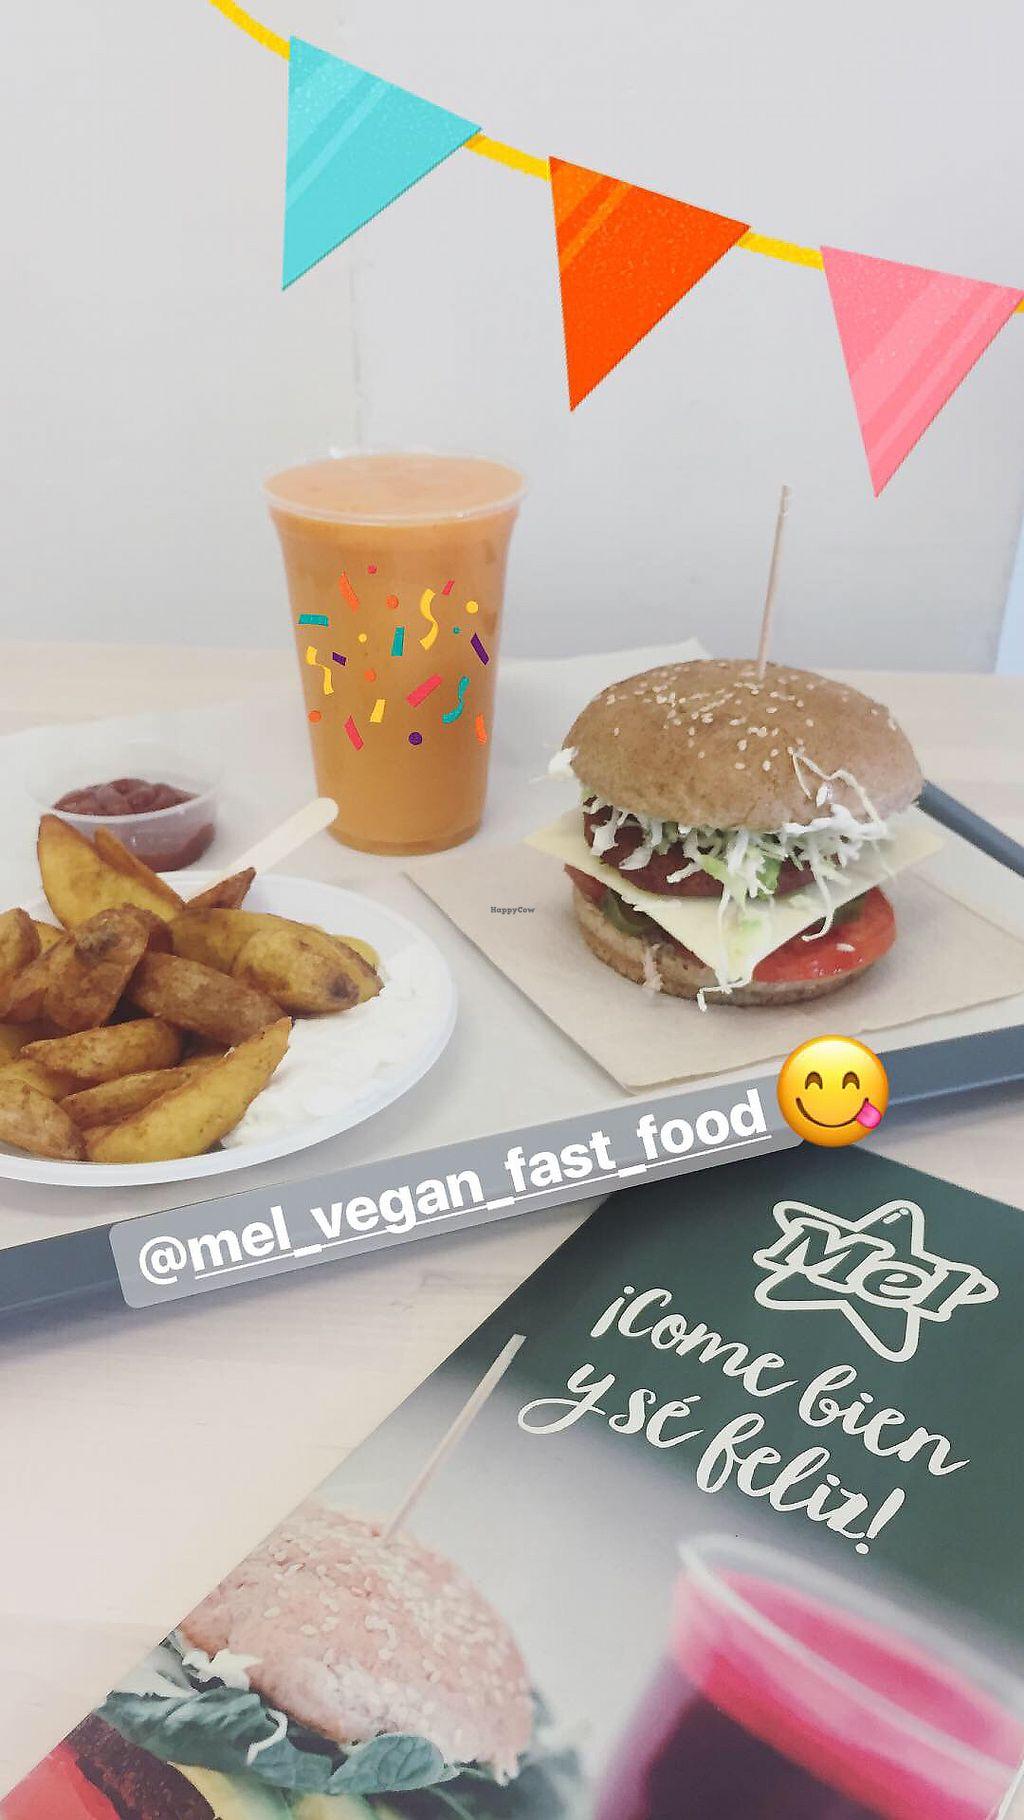 "Photo of Burger Mel - Suarez Guerra  by <a href=""/members/profile/p.fdez"">p.fdez</a> <br/>Burger Mel vegan fast food <br/> September 24, 2017  - <a href='/contact/abuse/image/86504/307920'>Report</a>"